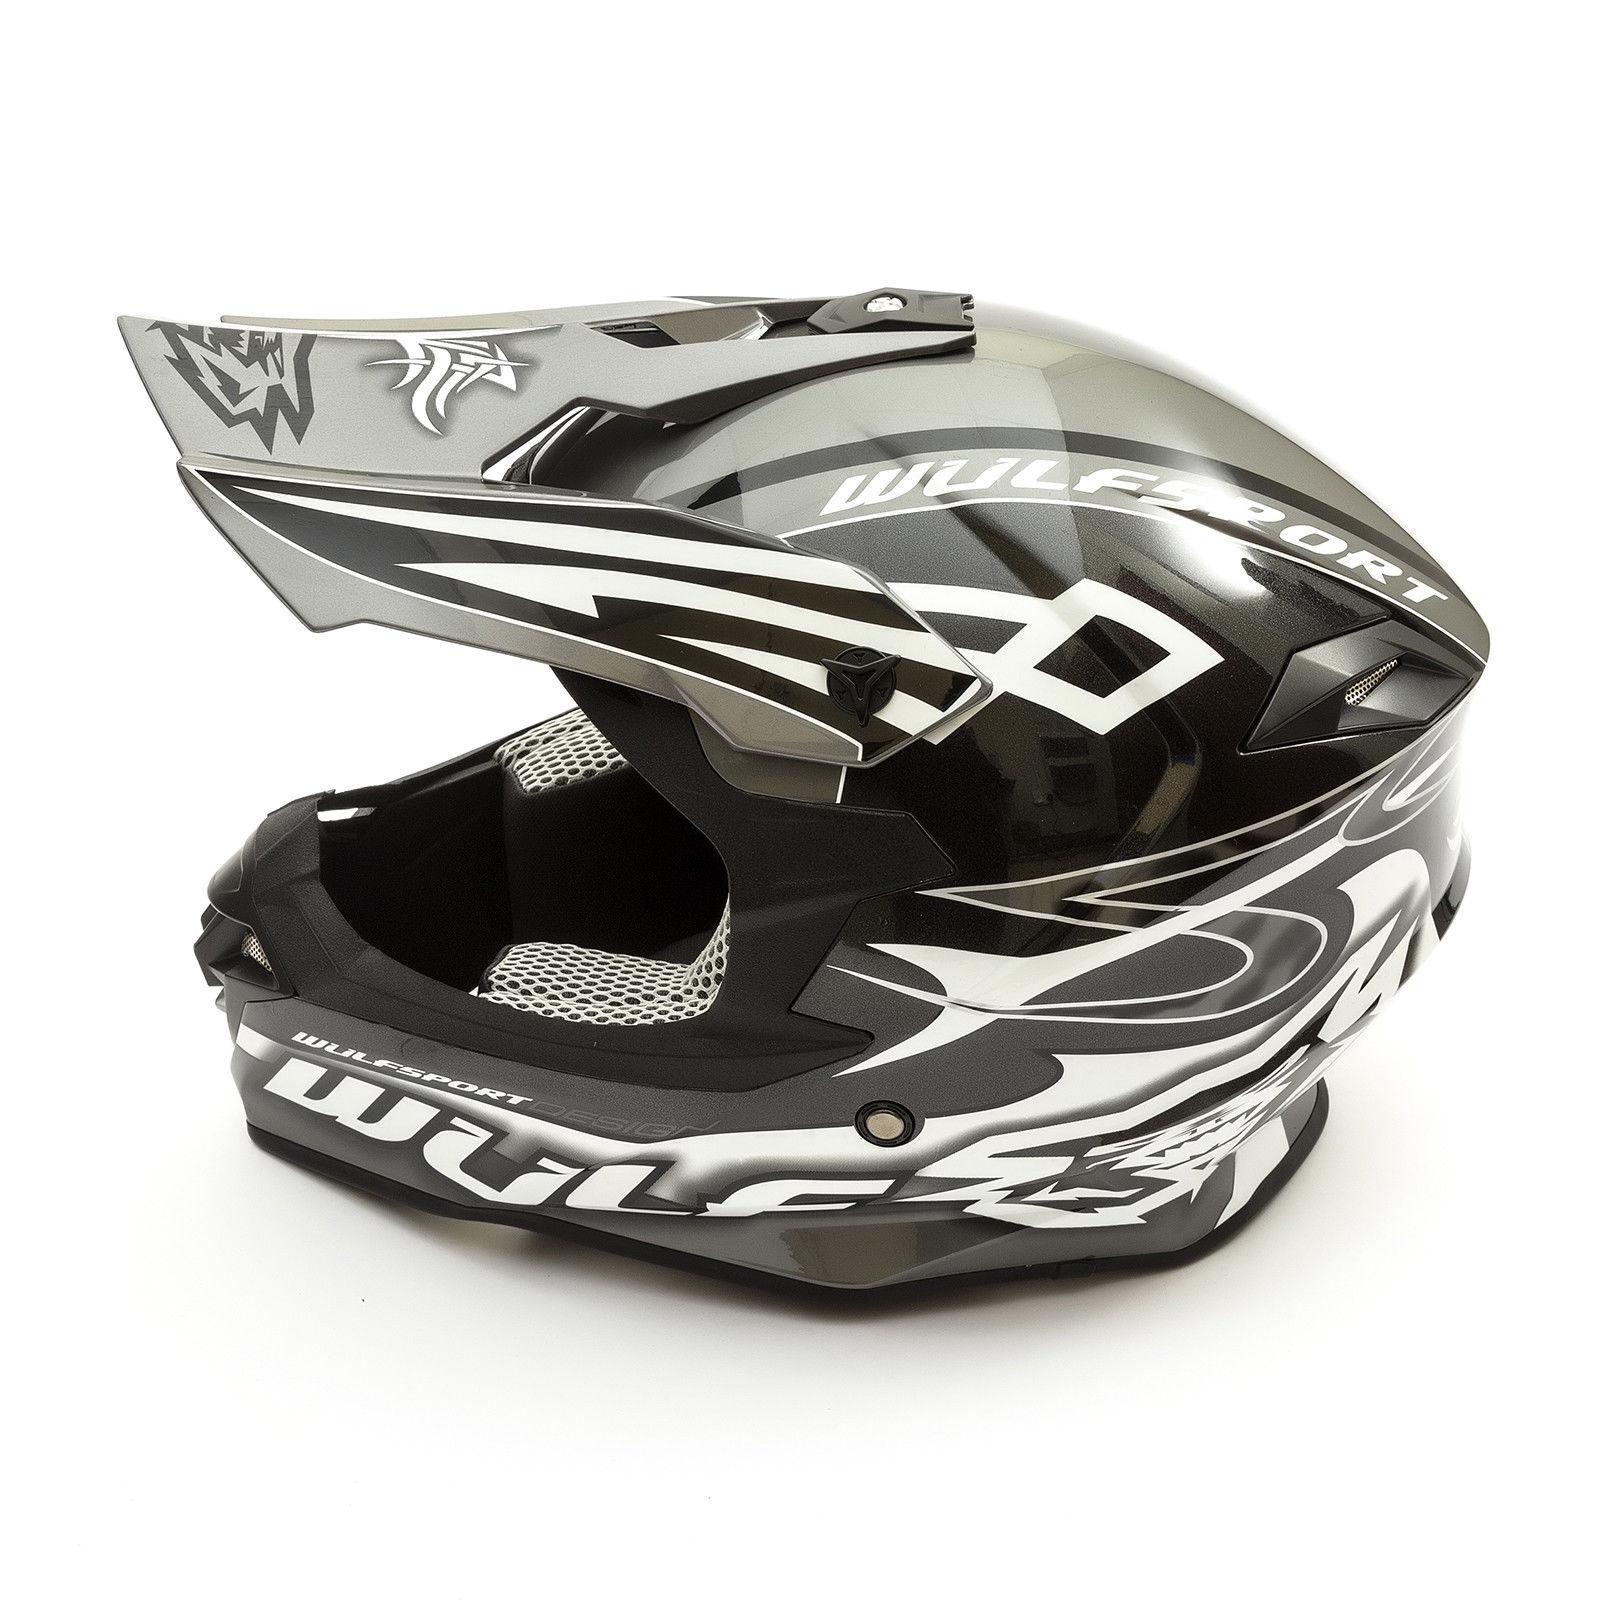 Wulfsport-Adult-Sceptre-Helmets-Motocross-Pitbike-Motorbike-Off-Road-Racing-ATV thumbnail 4